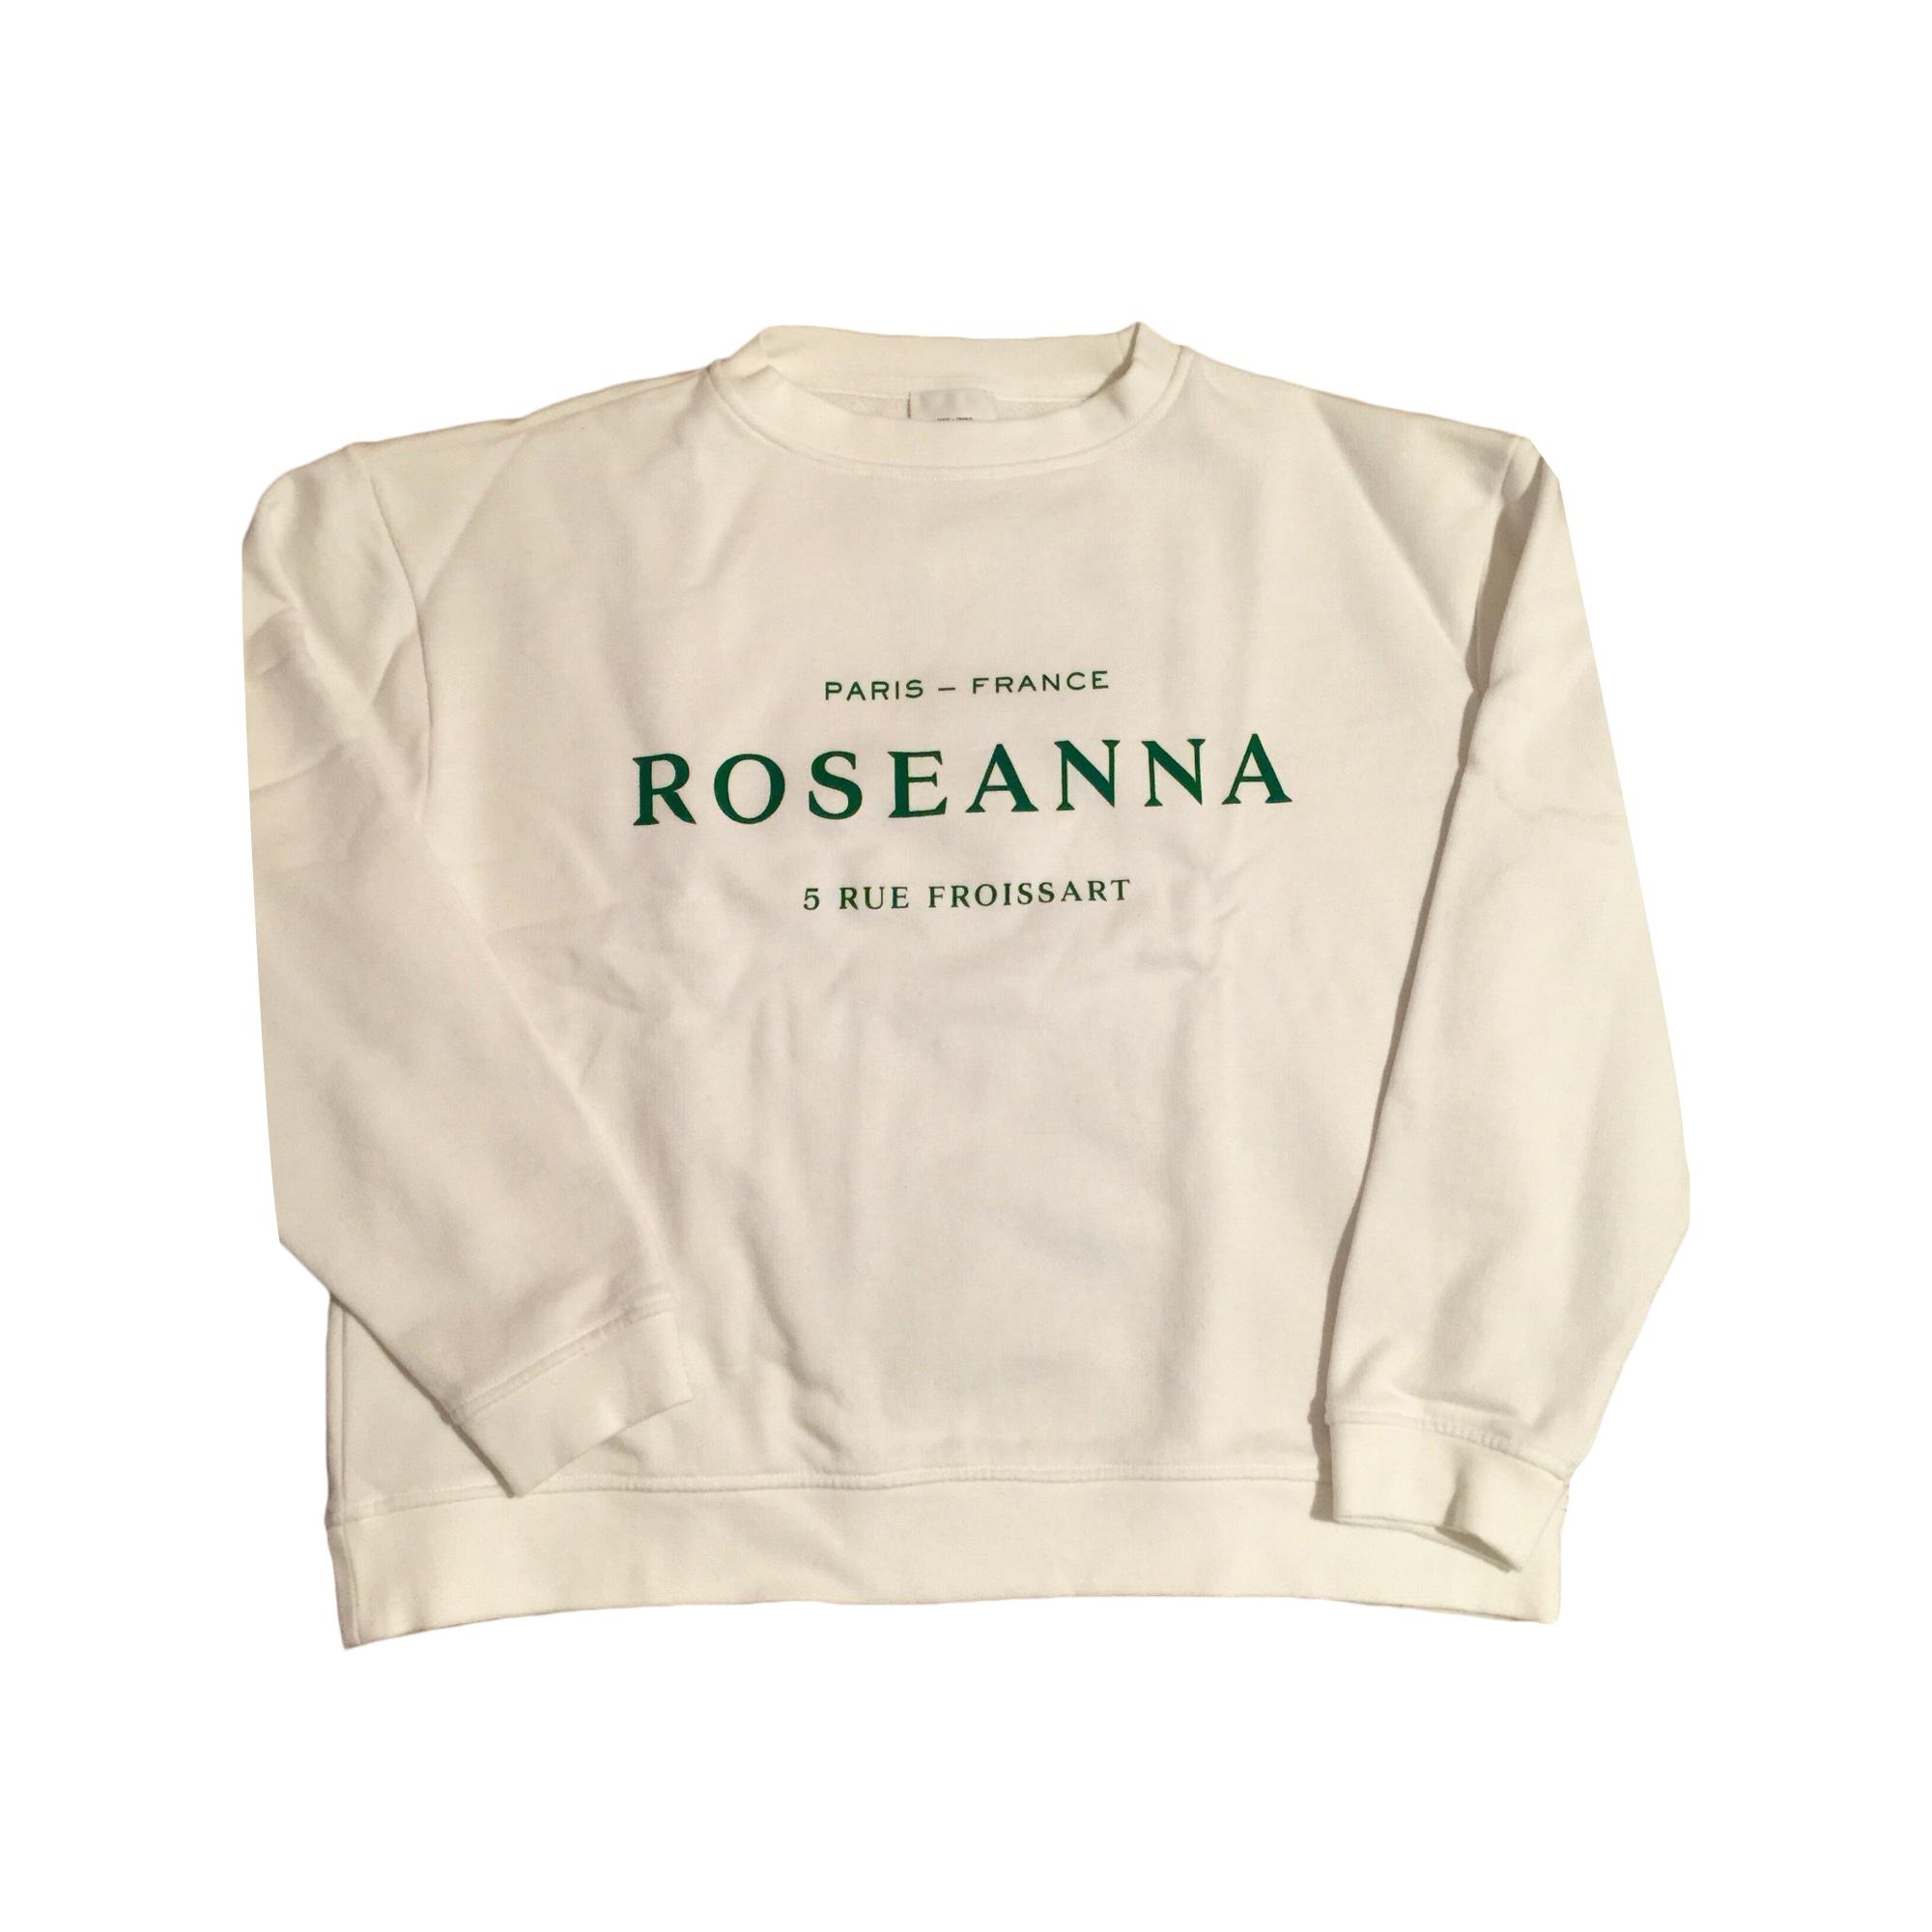 Sweatshirt ROSEANNA White, off-white, ecru